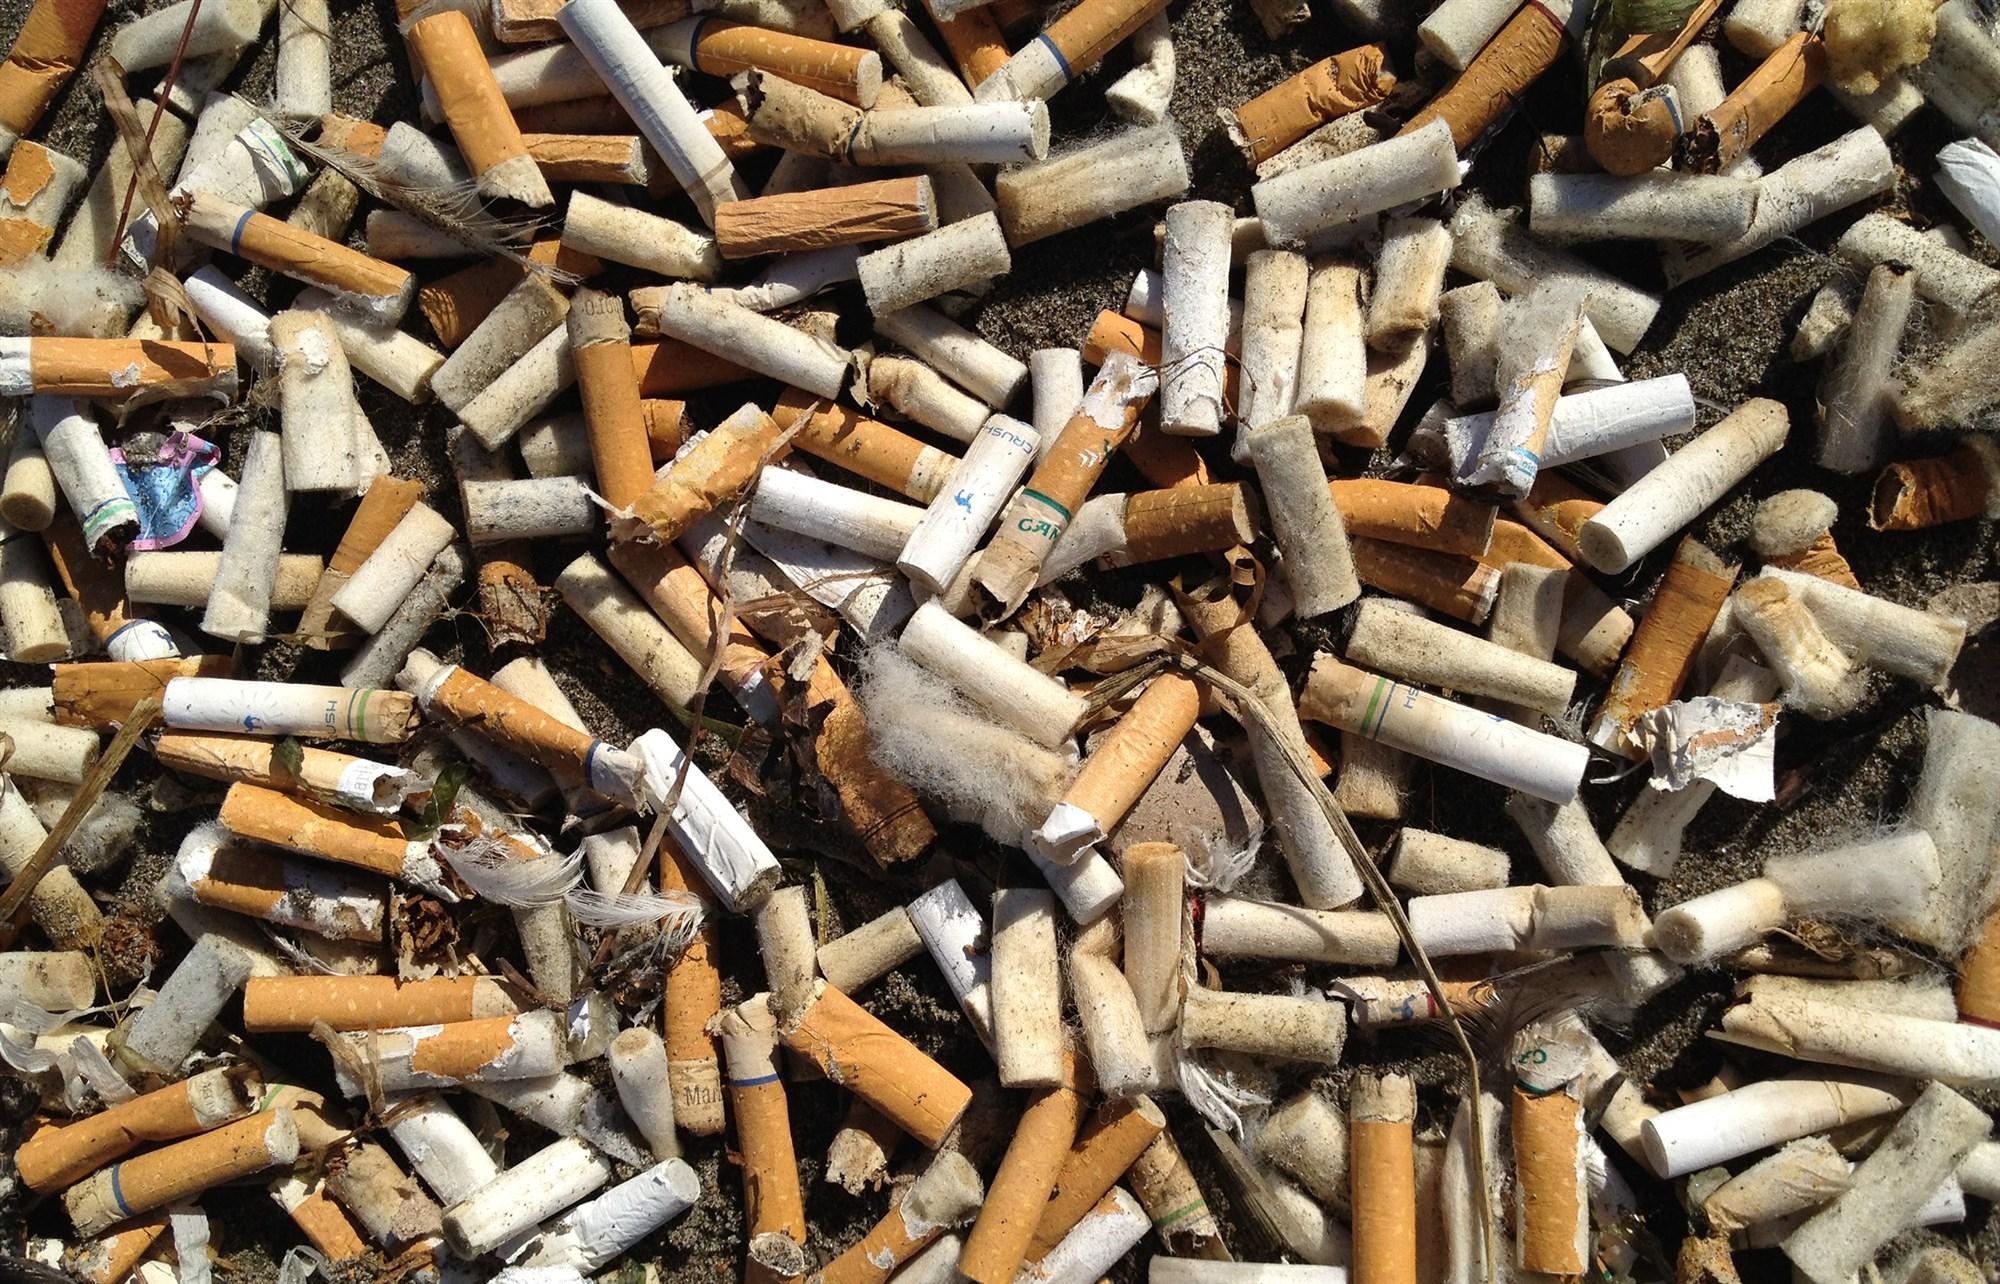 180824-oregon-cigarette-cleanup-al-1646_c1ffc2ed87fd0f3222c4f11621d4da7b.fit-2000w.jpg